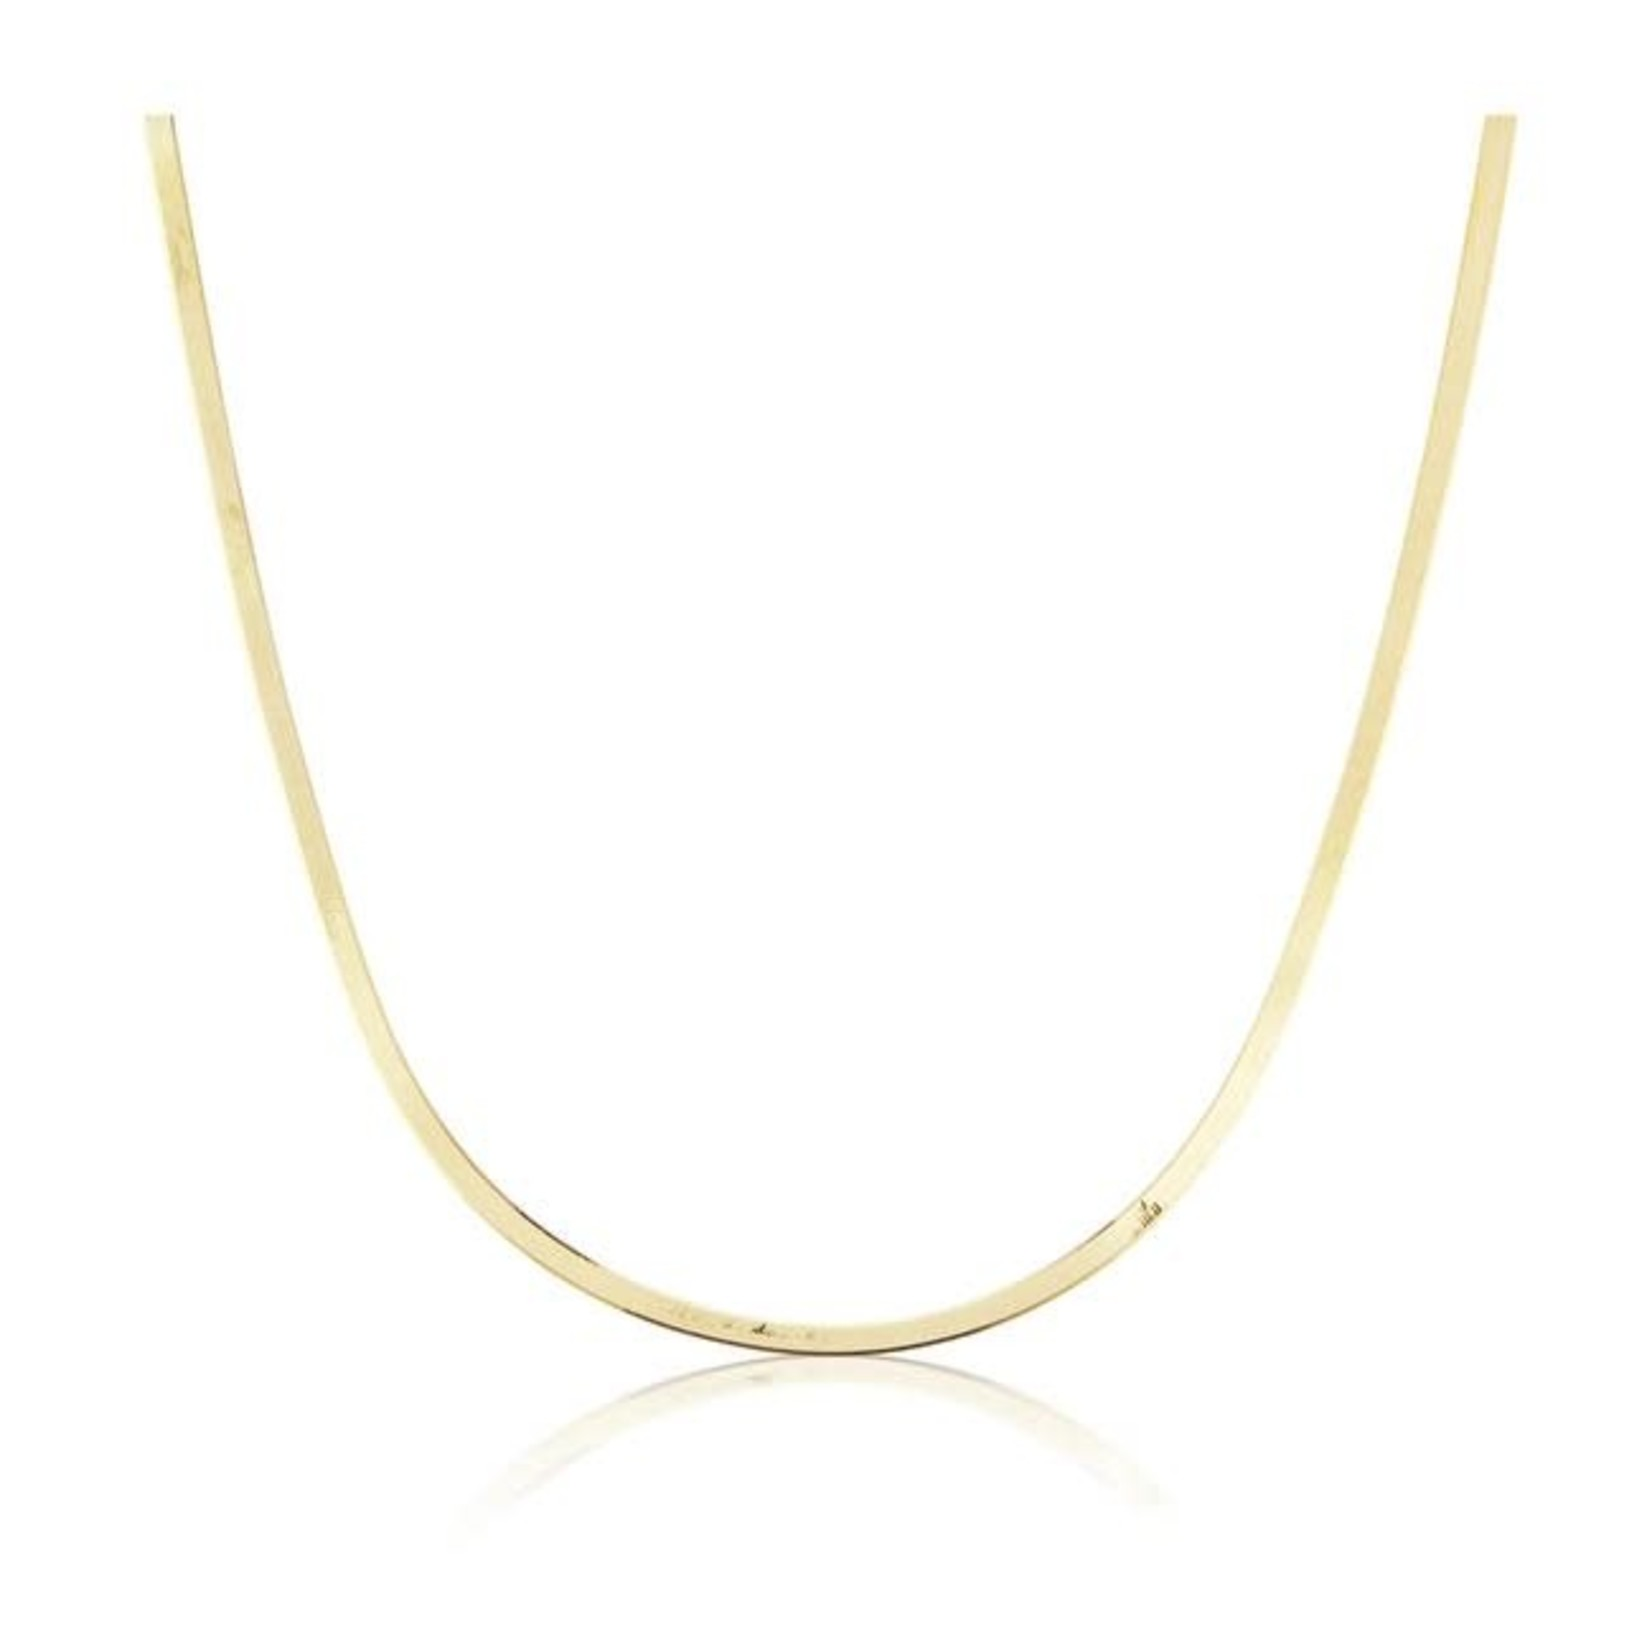 KBH Jewels Liquid Gold Herringbone Necklace